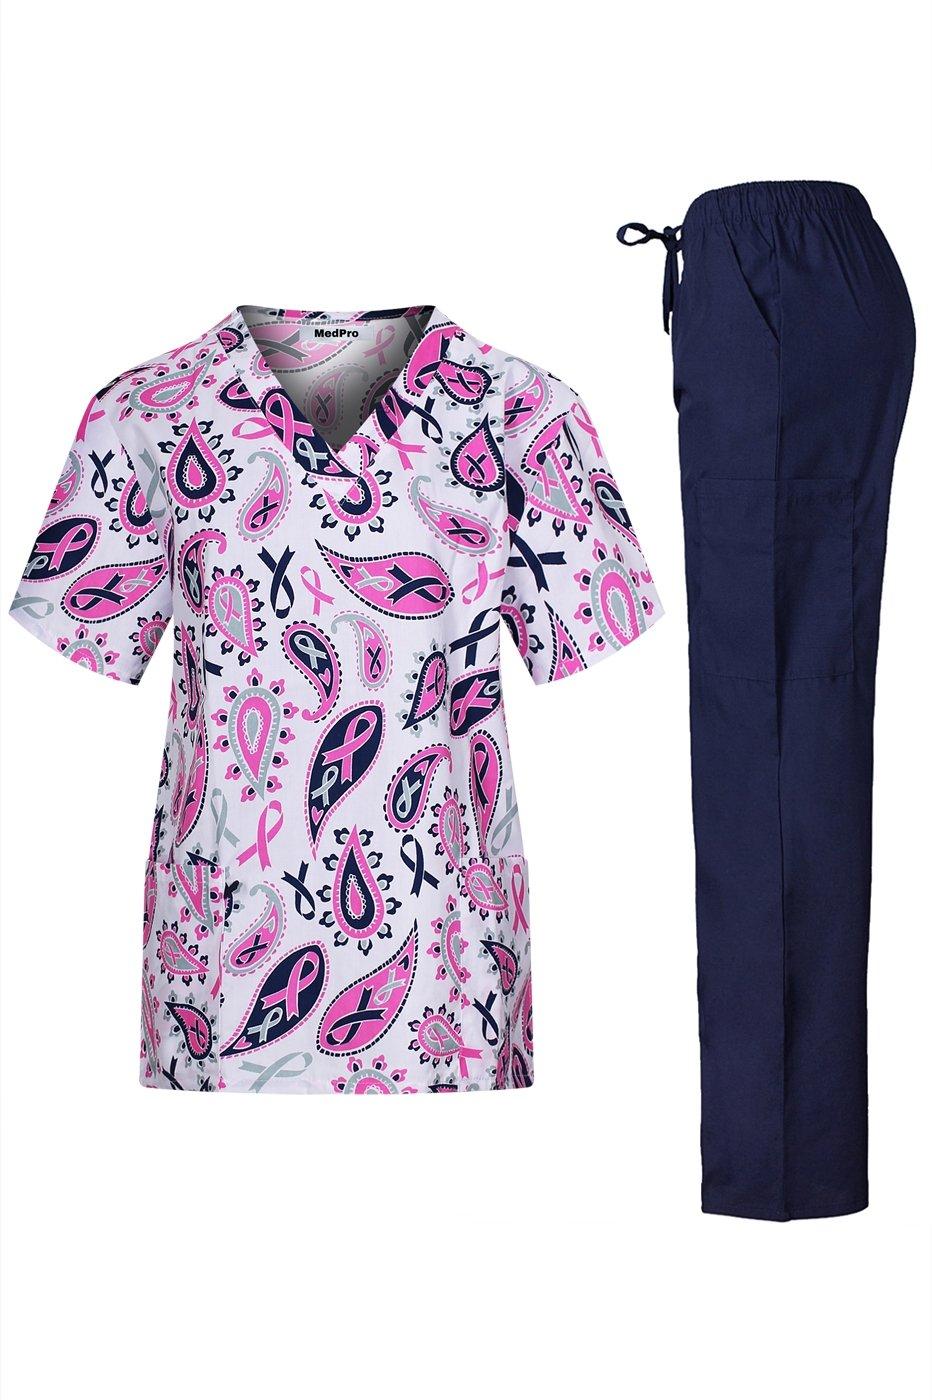 MedPro Women's Medical Scrub Set V Neck Top Cargo Pants Purple Navy 2X